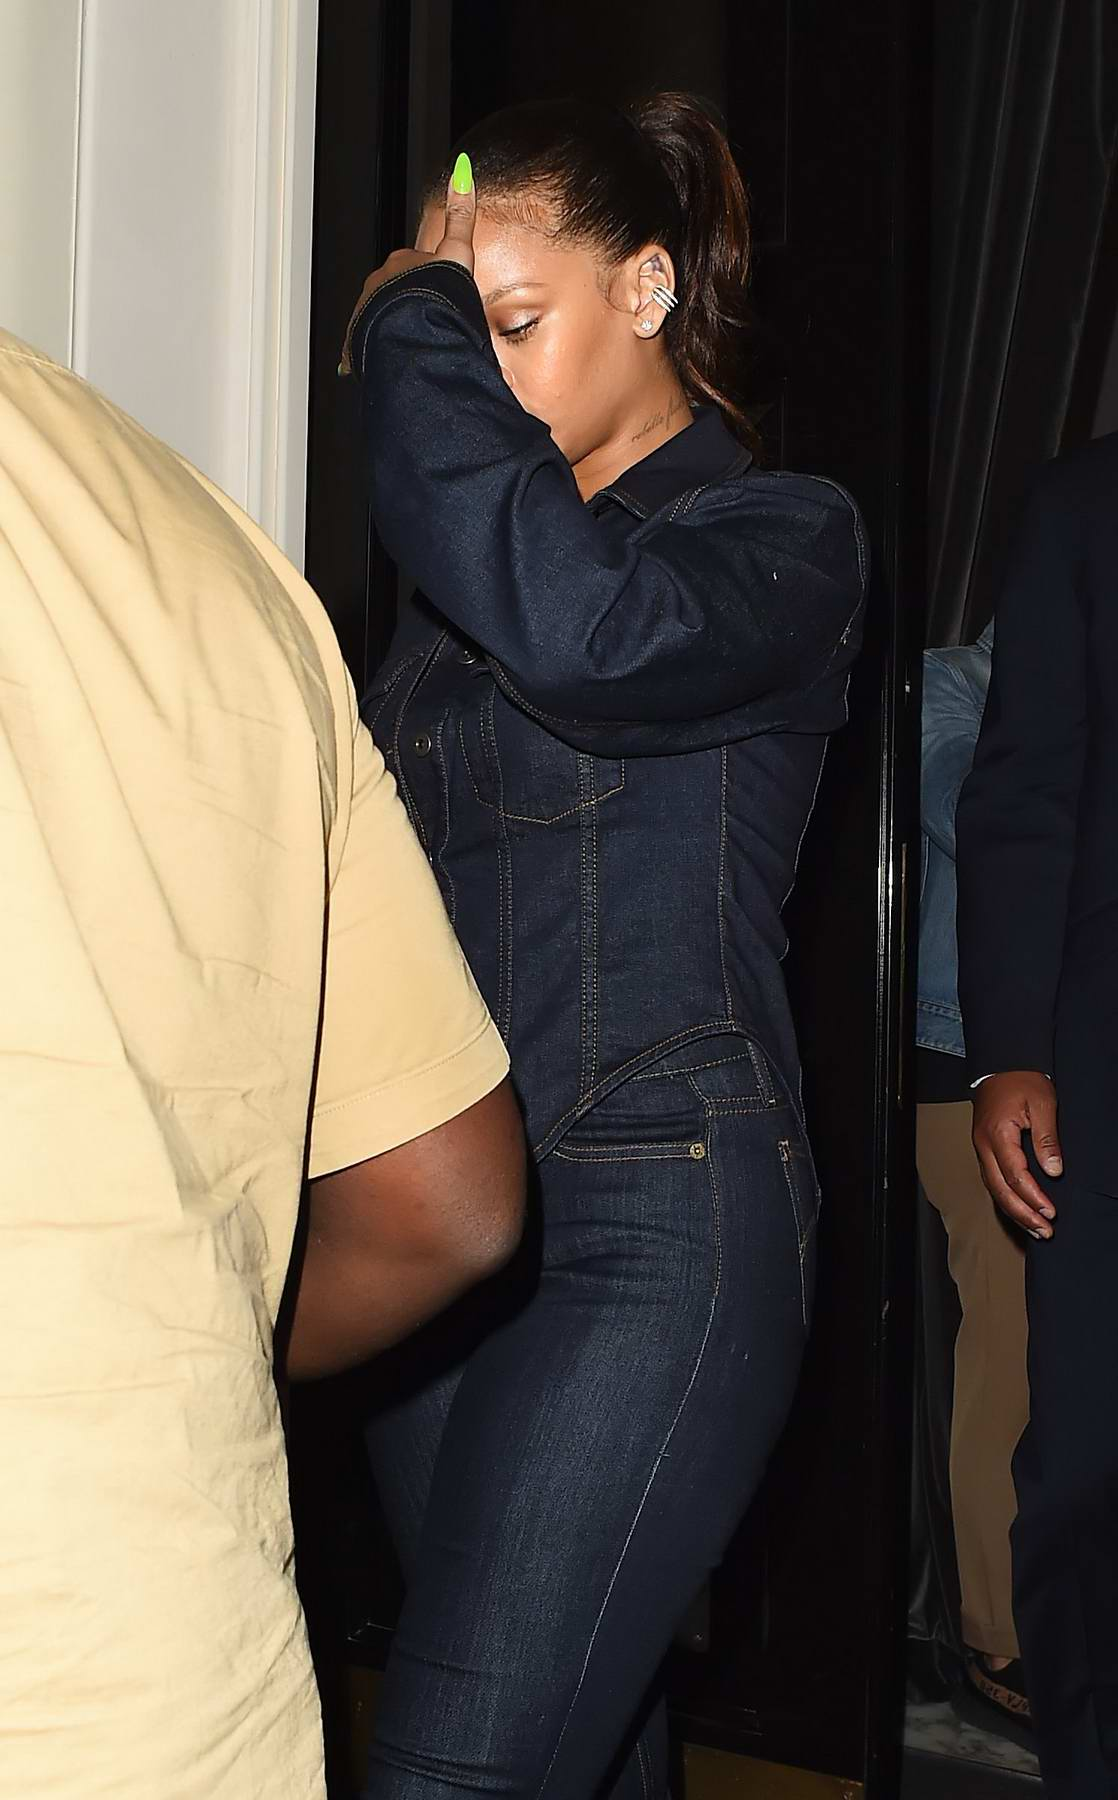 Rihanna dressed in all denim leaving her hotel in London